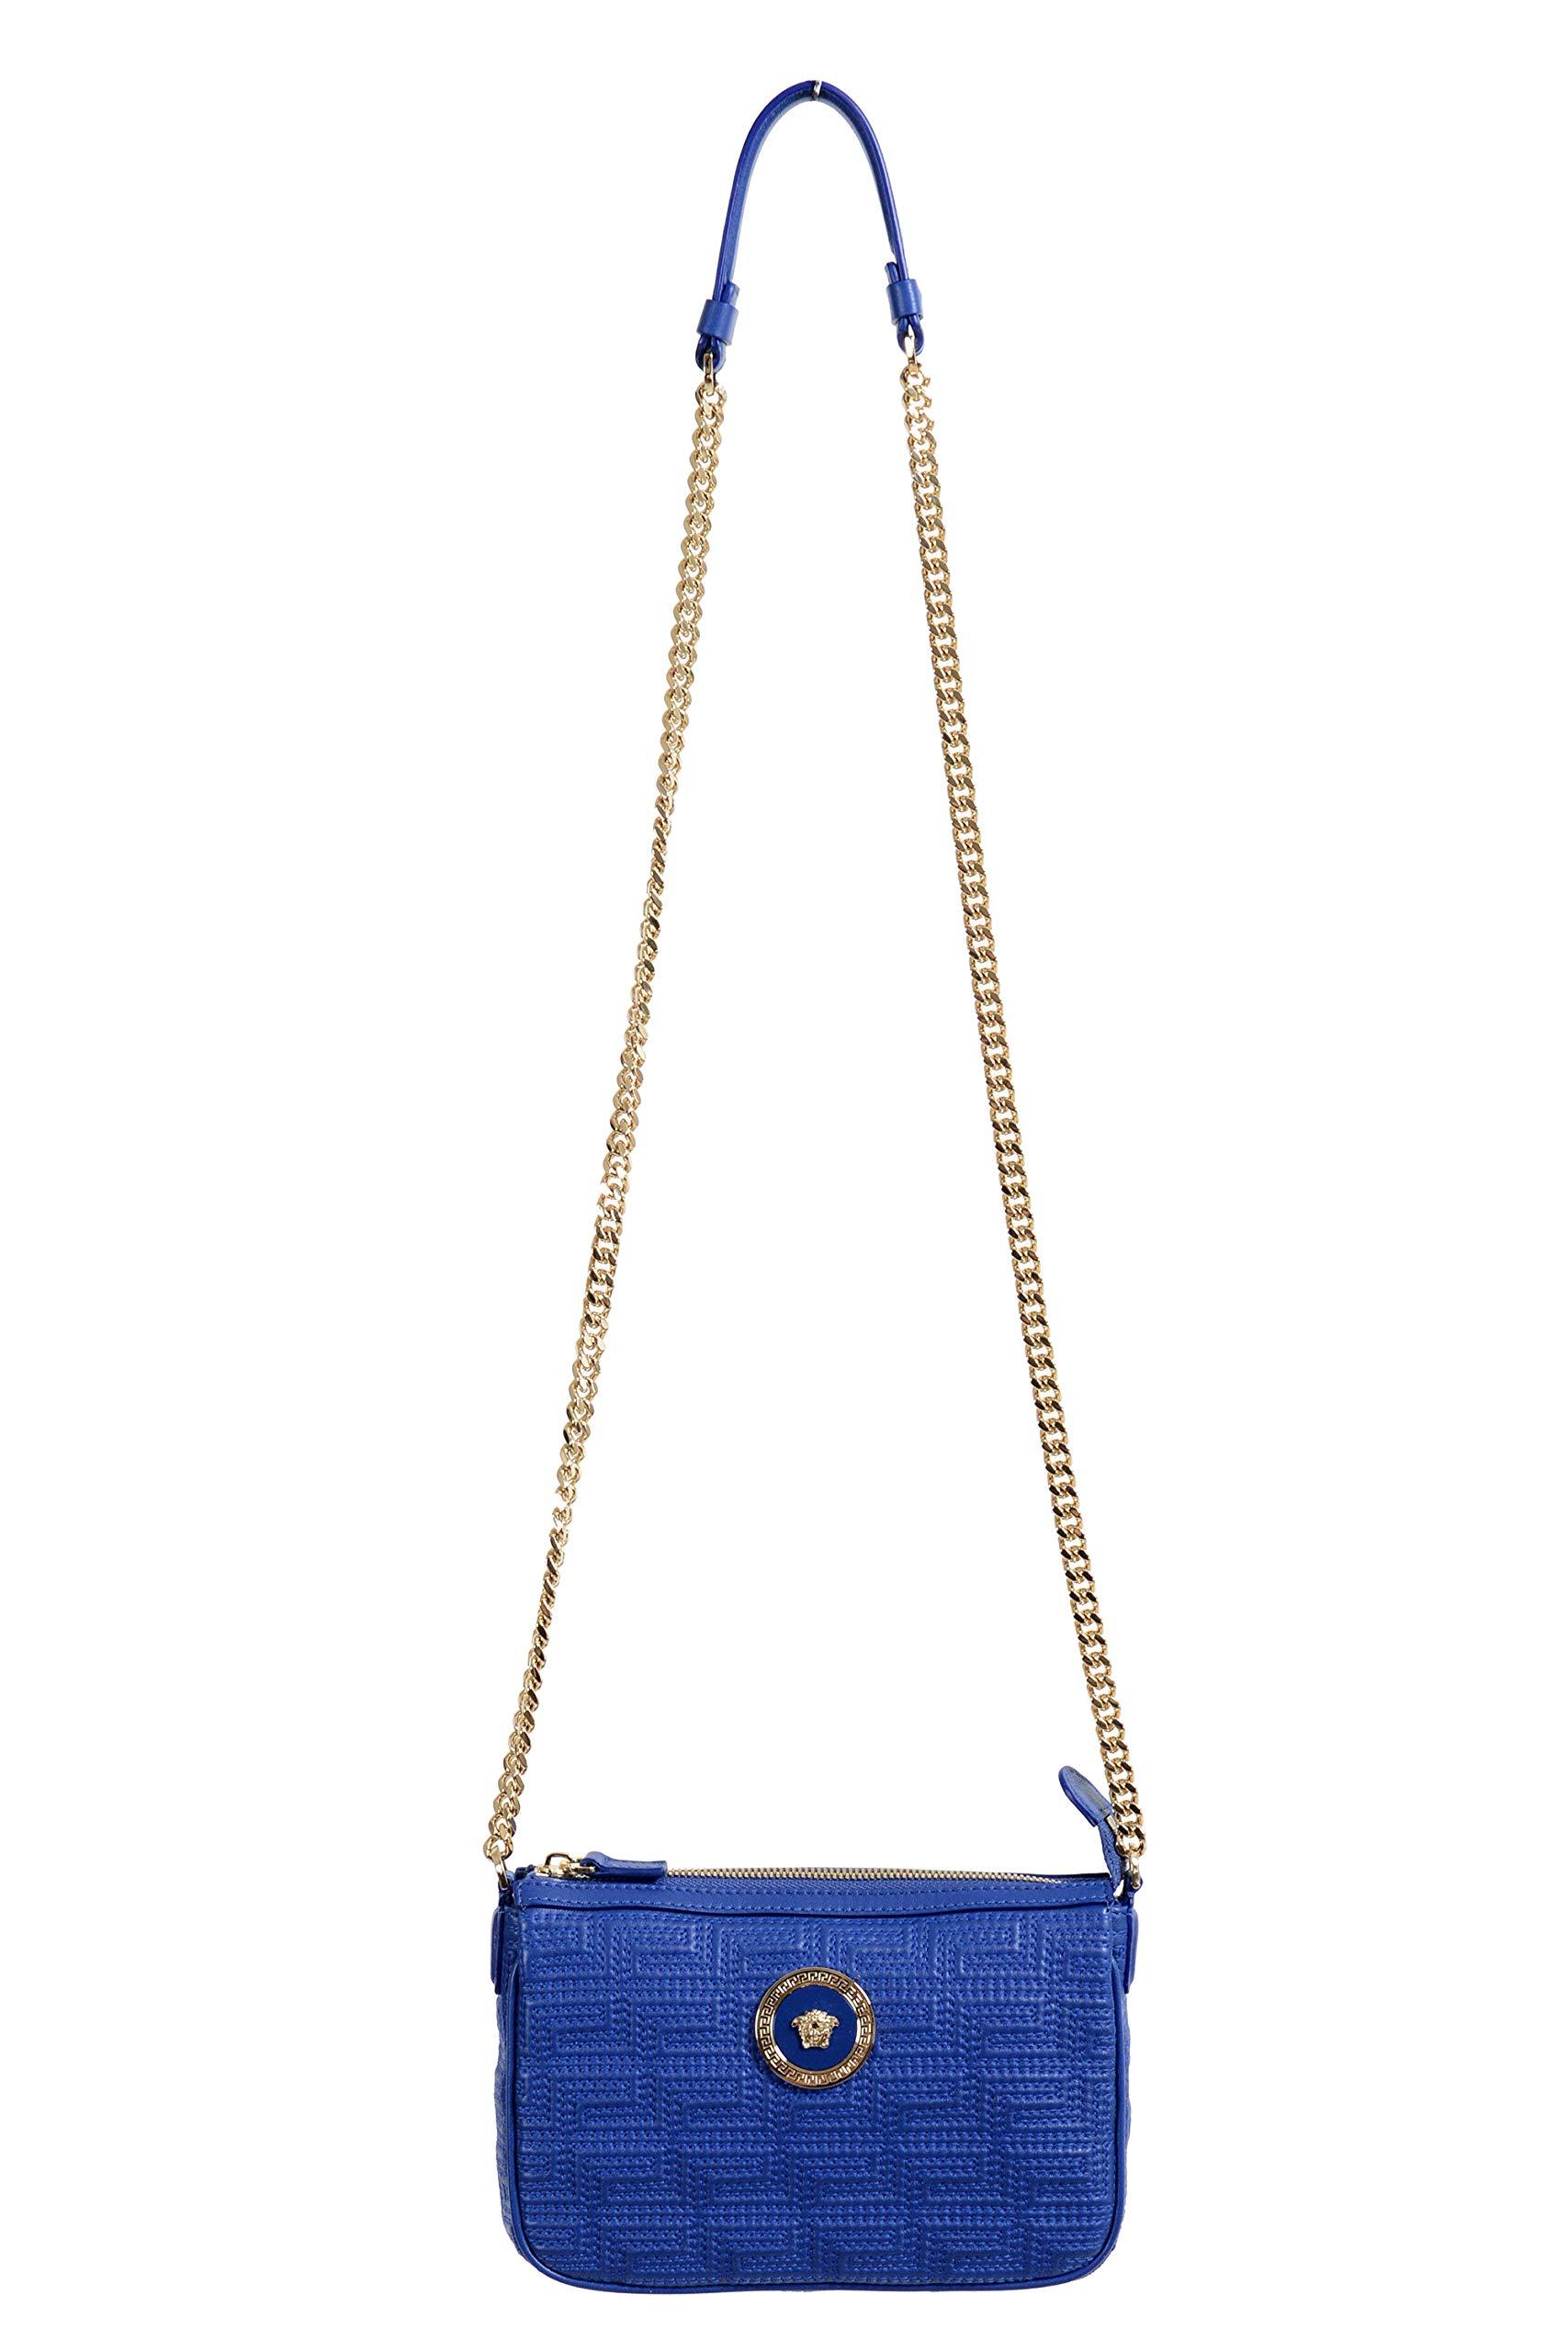 100% Leather Blue Chain Strap Women's Crossbody Shoulder Bag